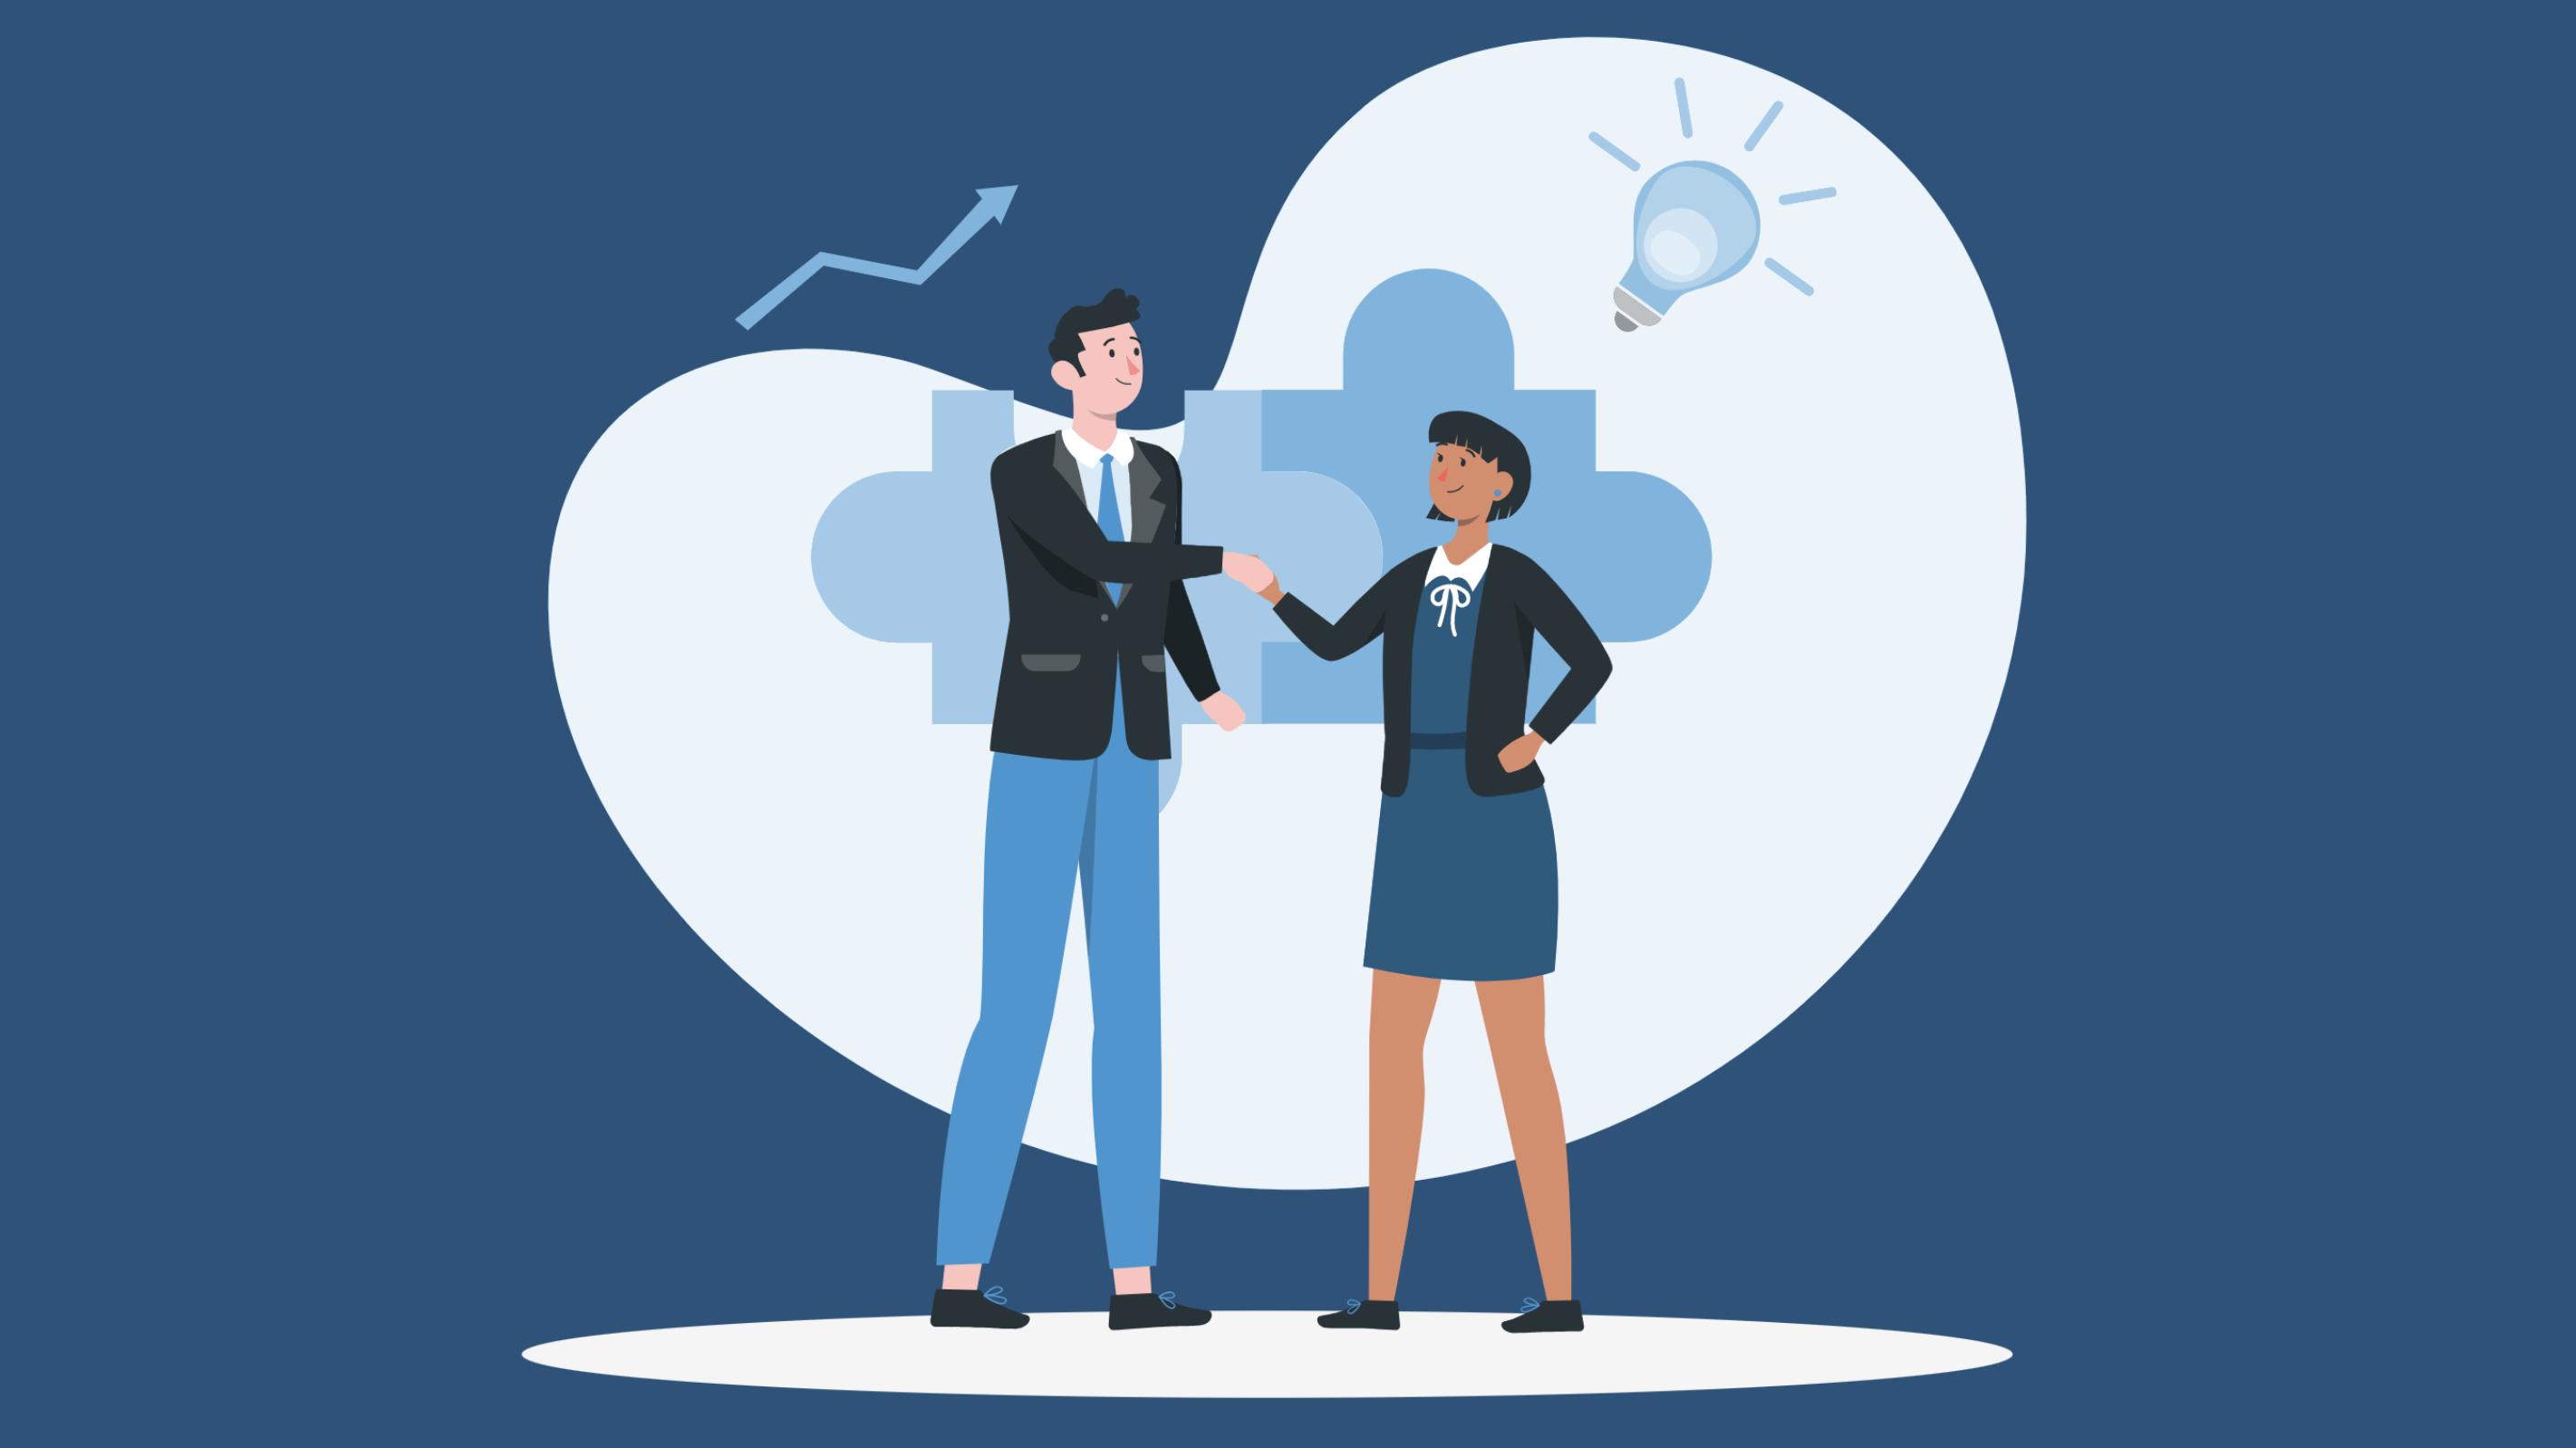 innovation procurement - illustration of two people sharing ideas